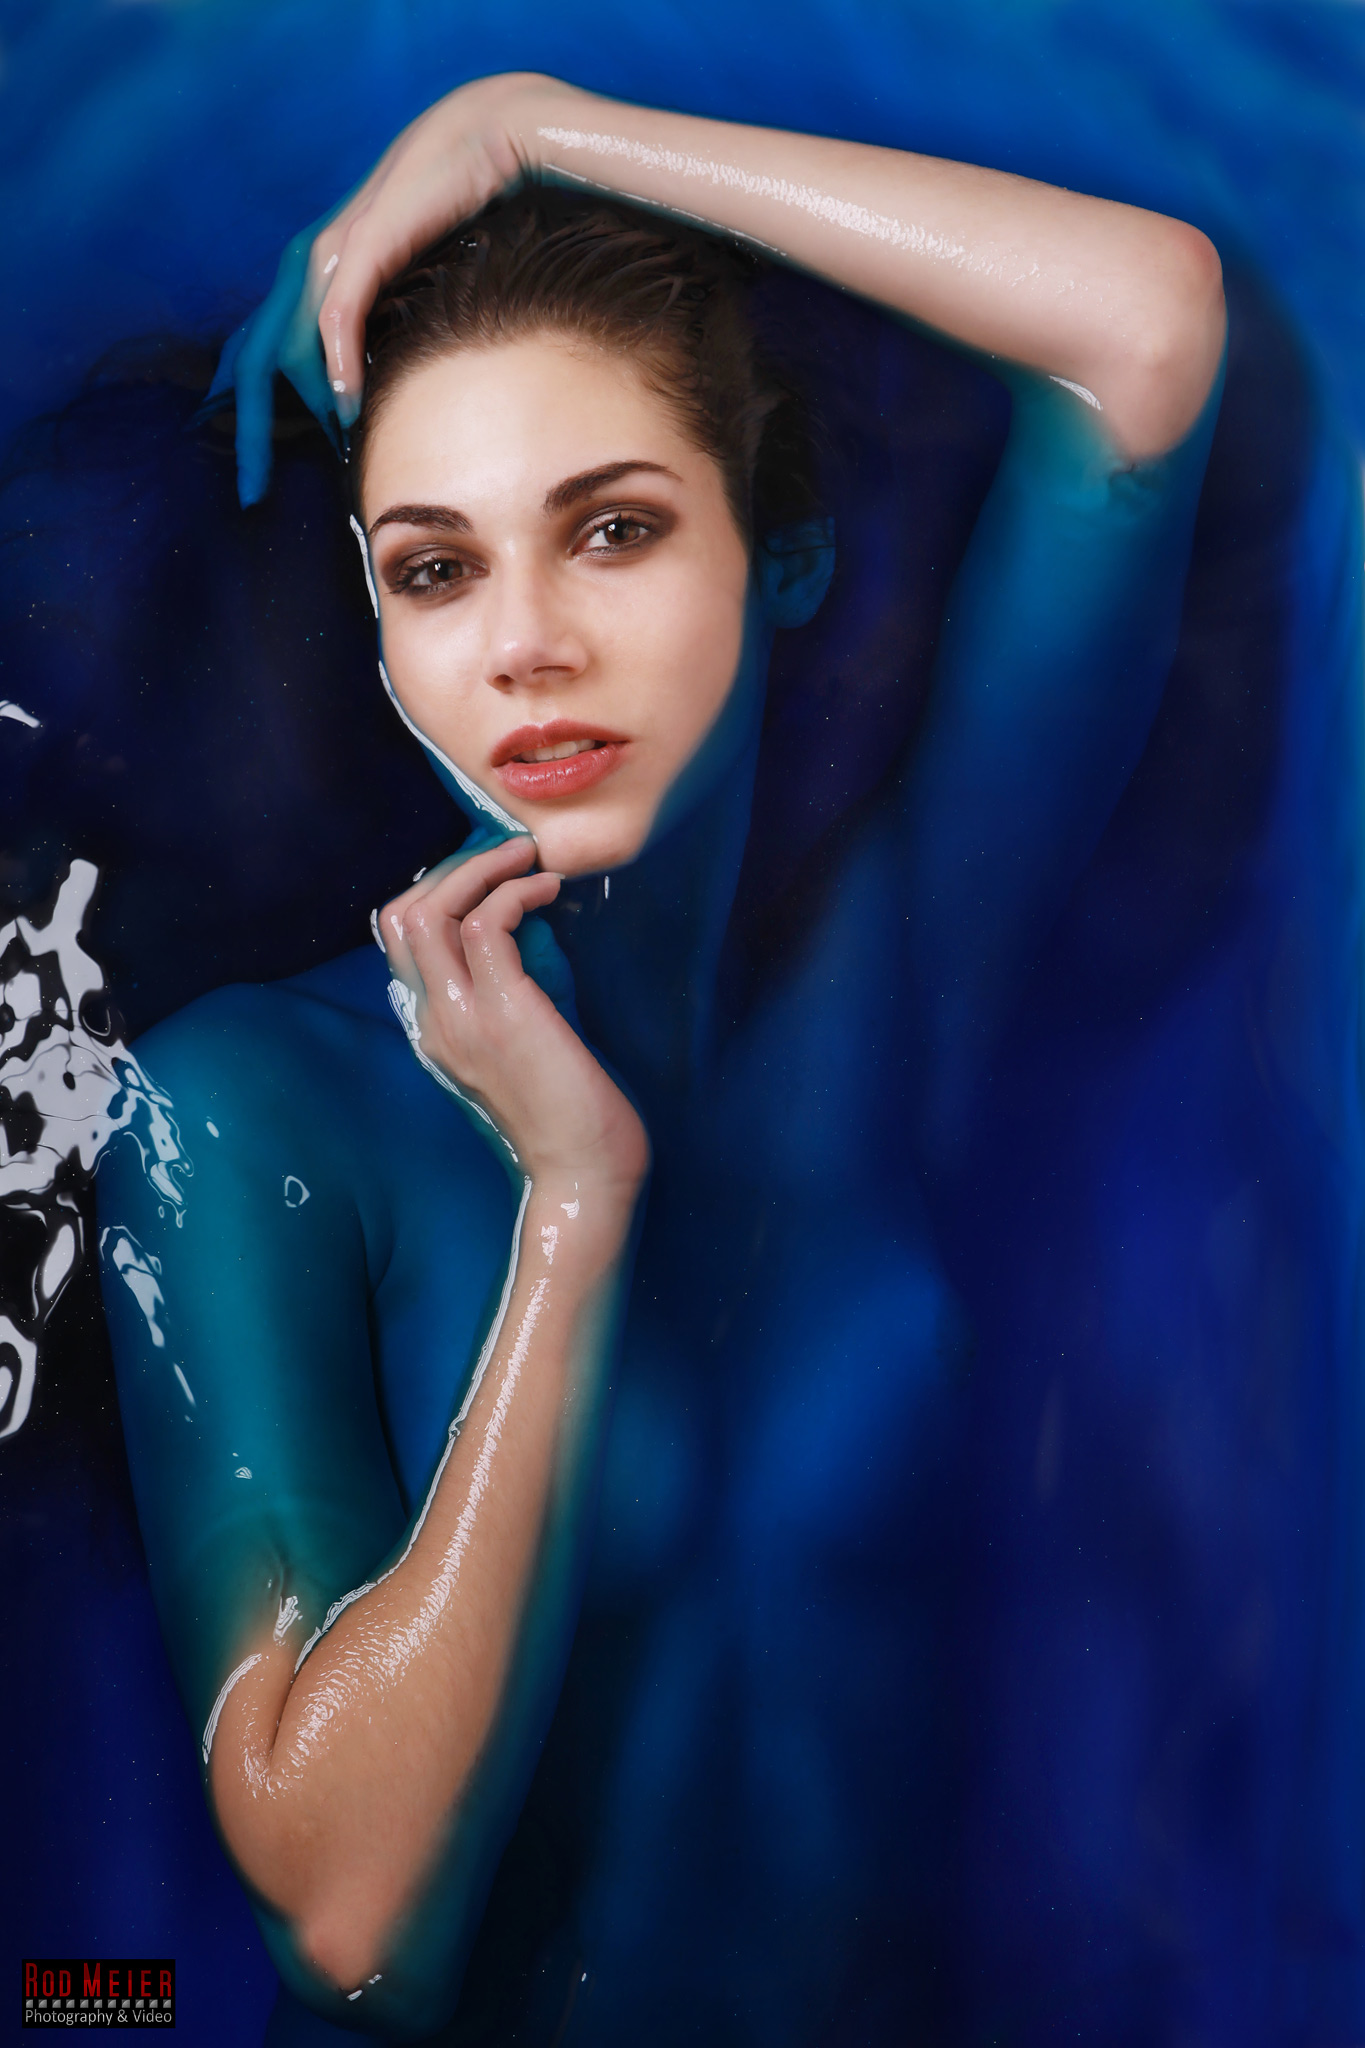 Blue Water Portrait - Badewannen Fotoshooting